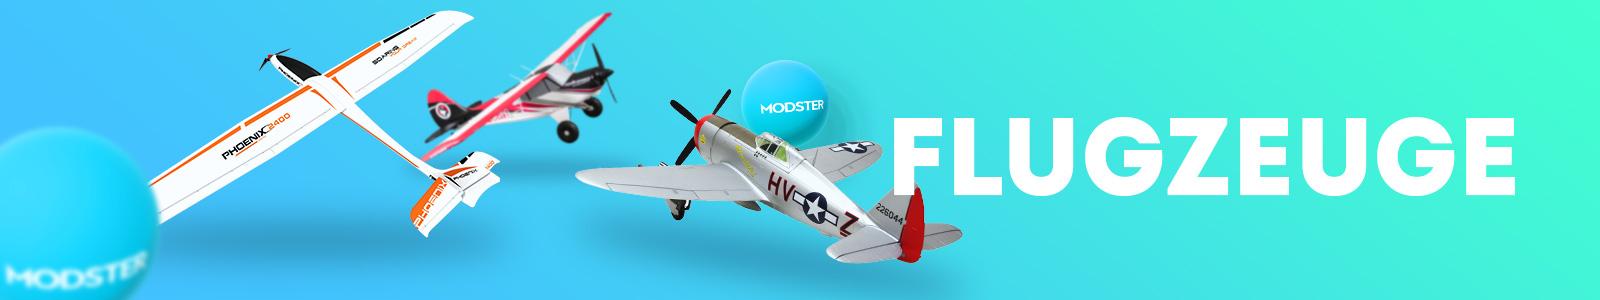 Modster-Flugmodelle-RC-Modellsport-Modellbau-Flugmodell-Radio-Control-Ferngesteuert